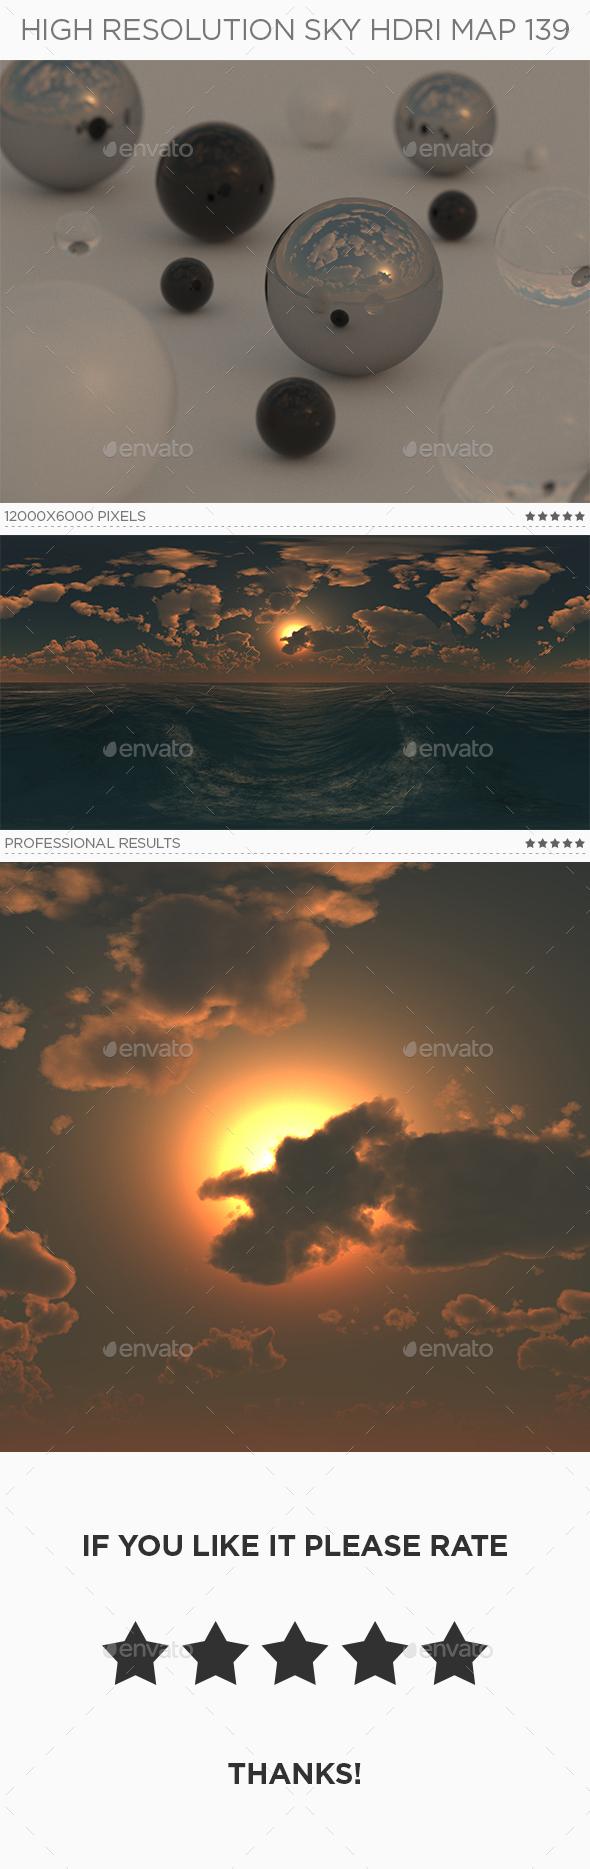 High Resolution Sky HDRi Map 139 - 3DOcean Item for Sale